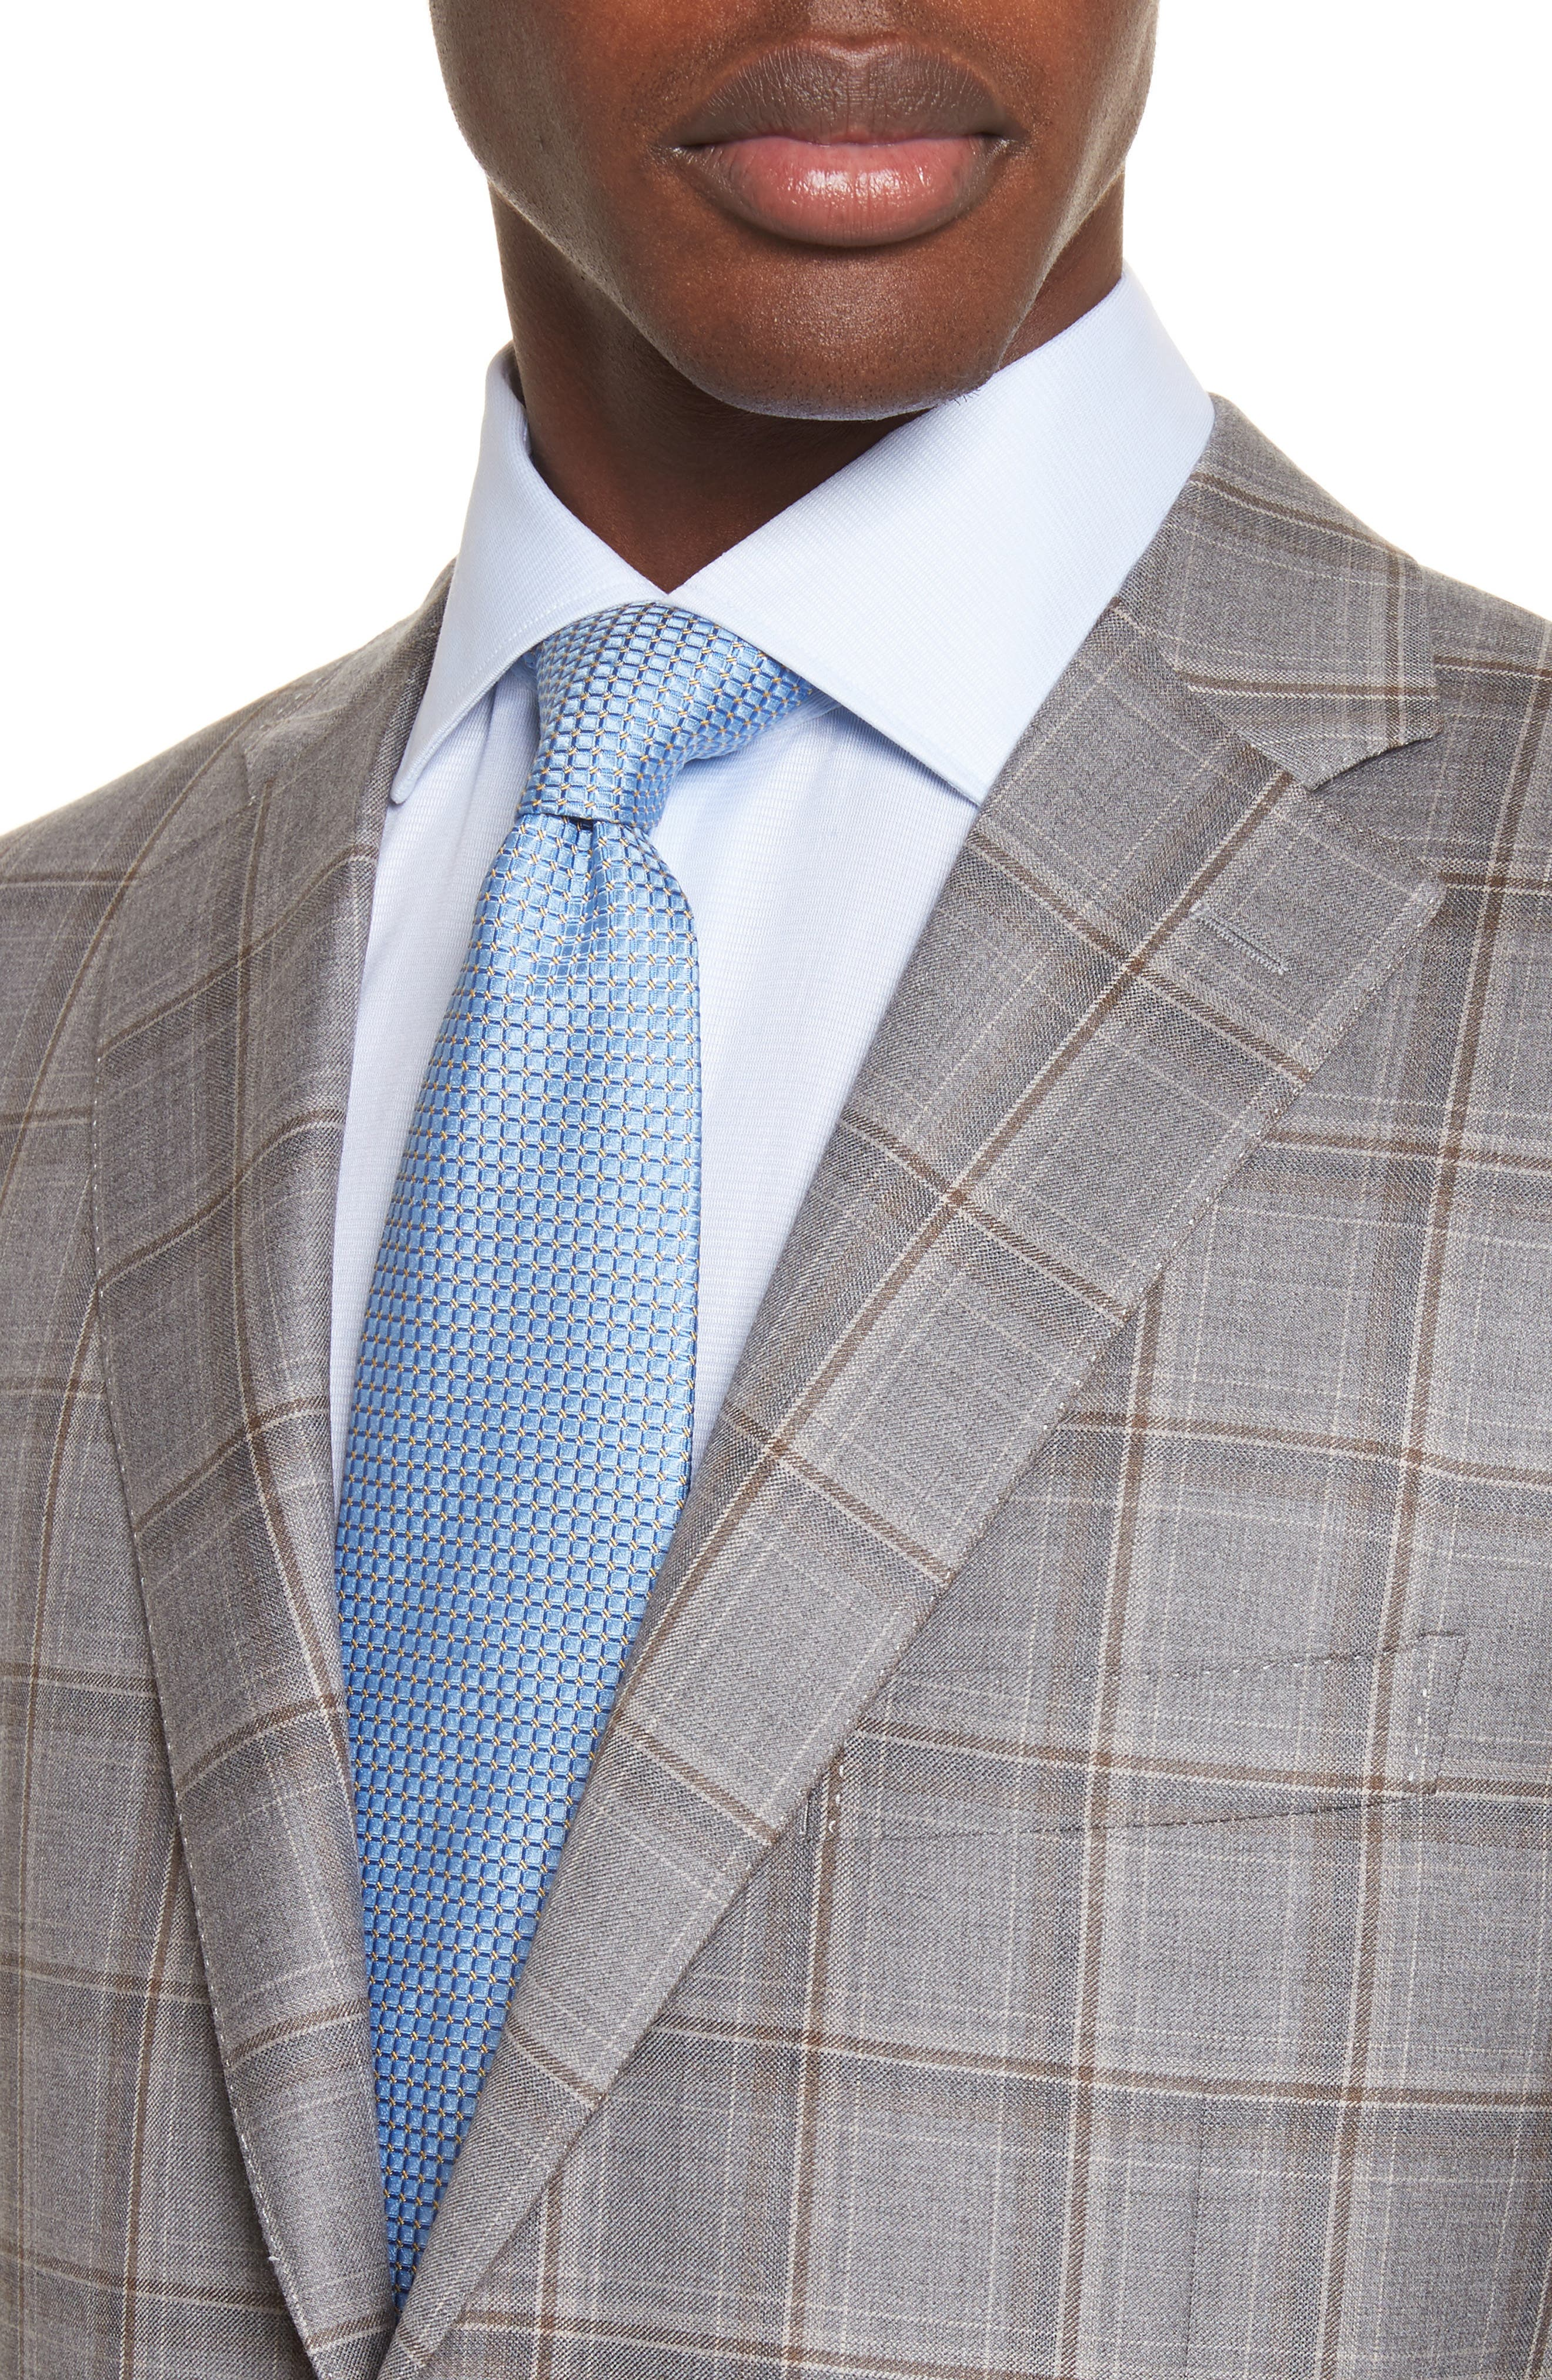 Classic Fit Plaid Wool Sport Coat,                             Alternate thumbnail 4, color,                             250